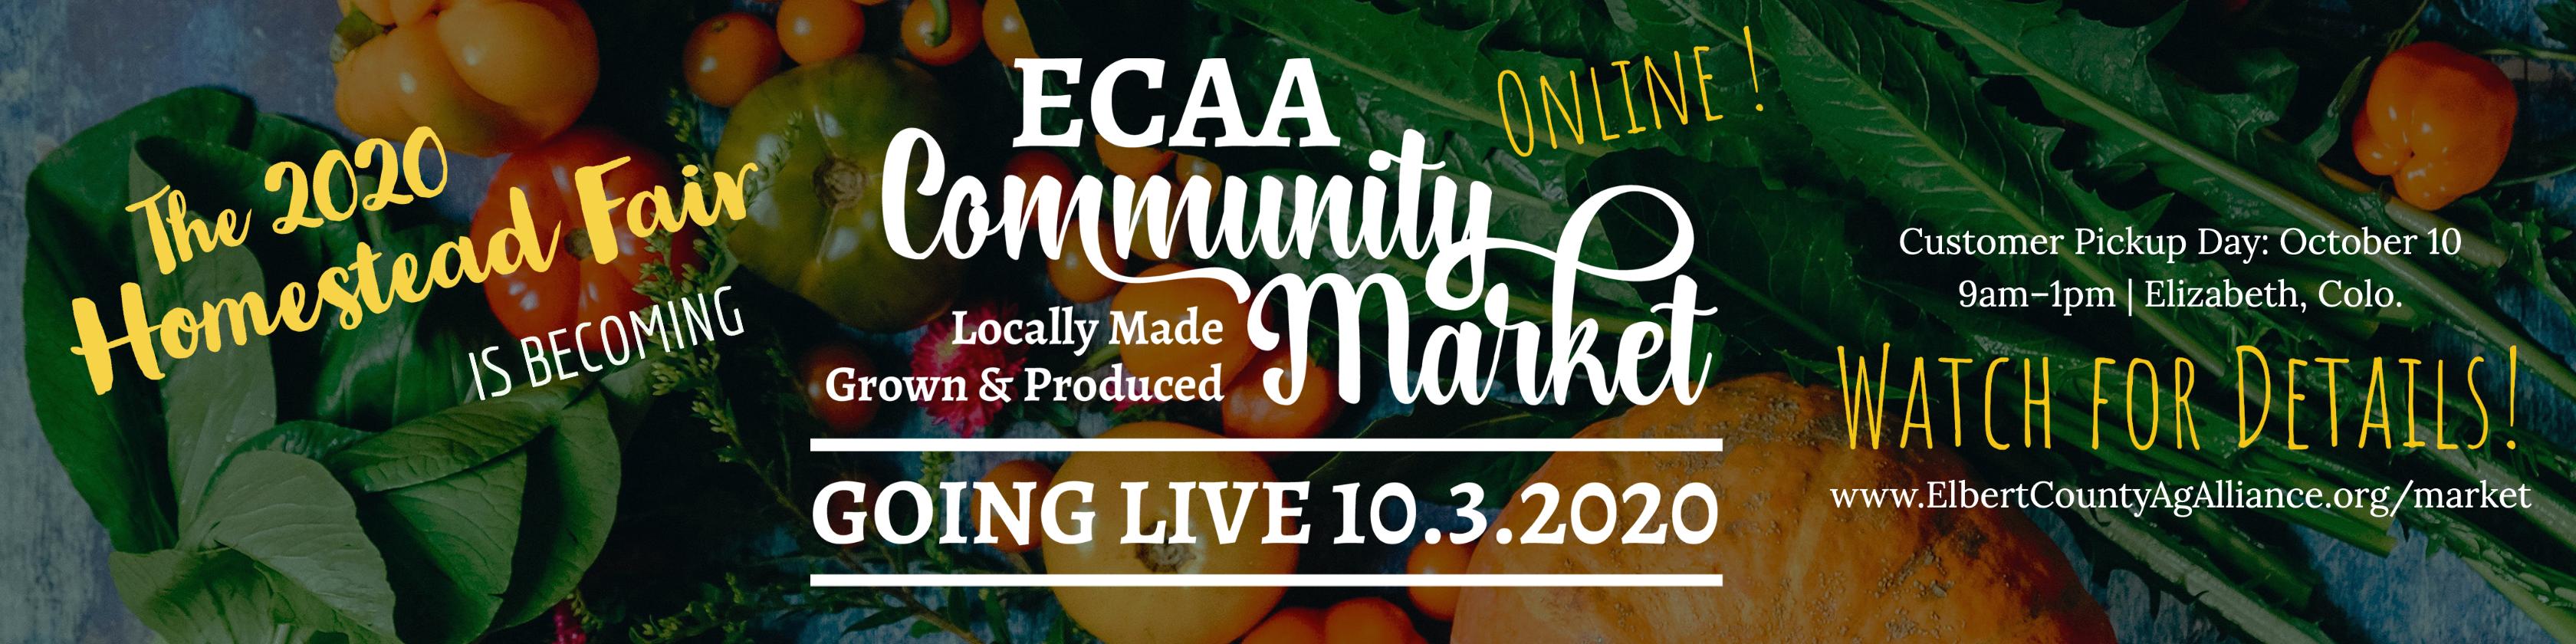 ECAA Community Market